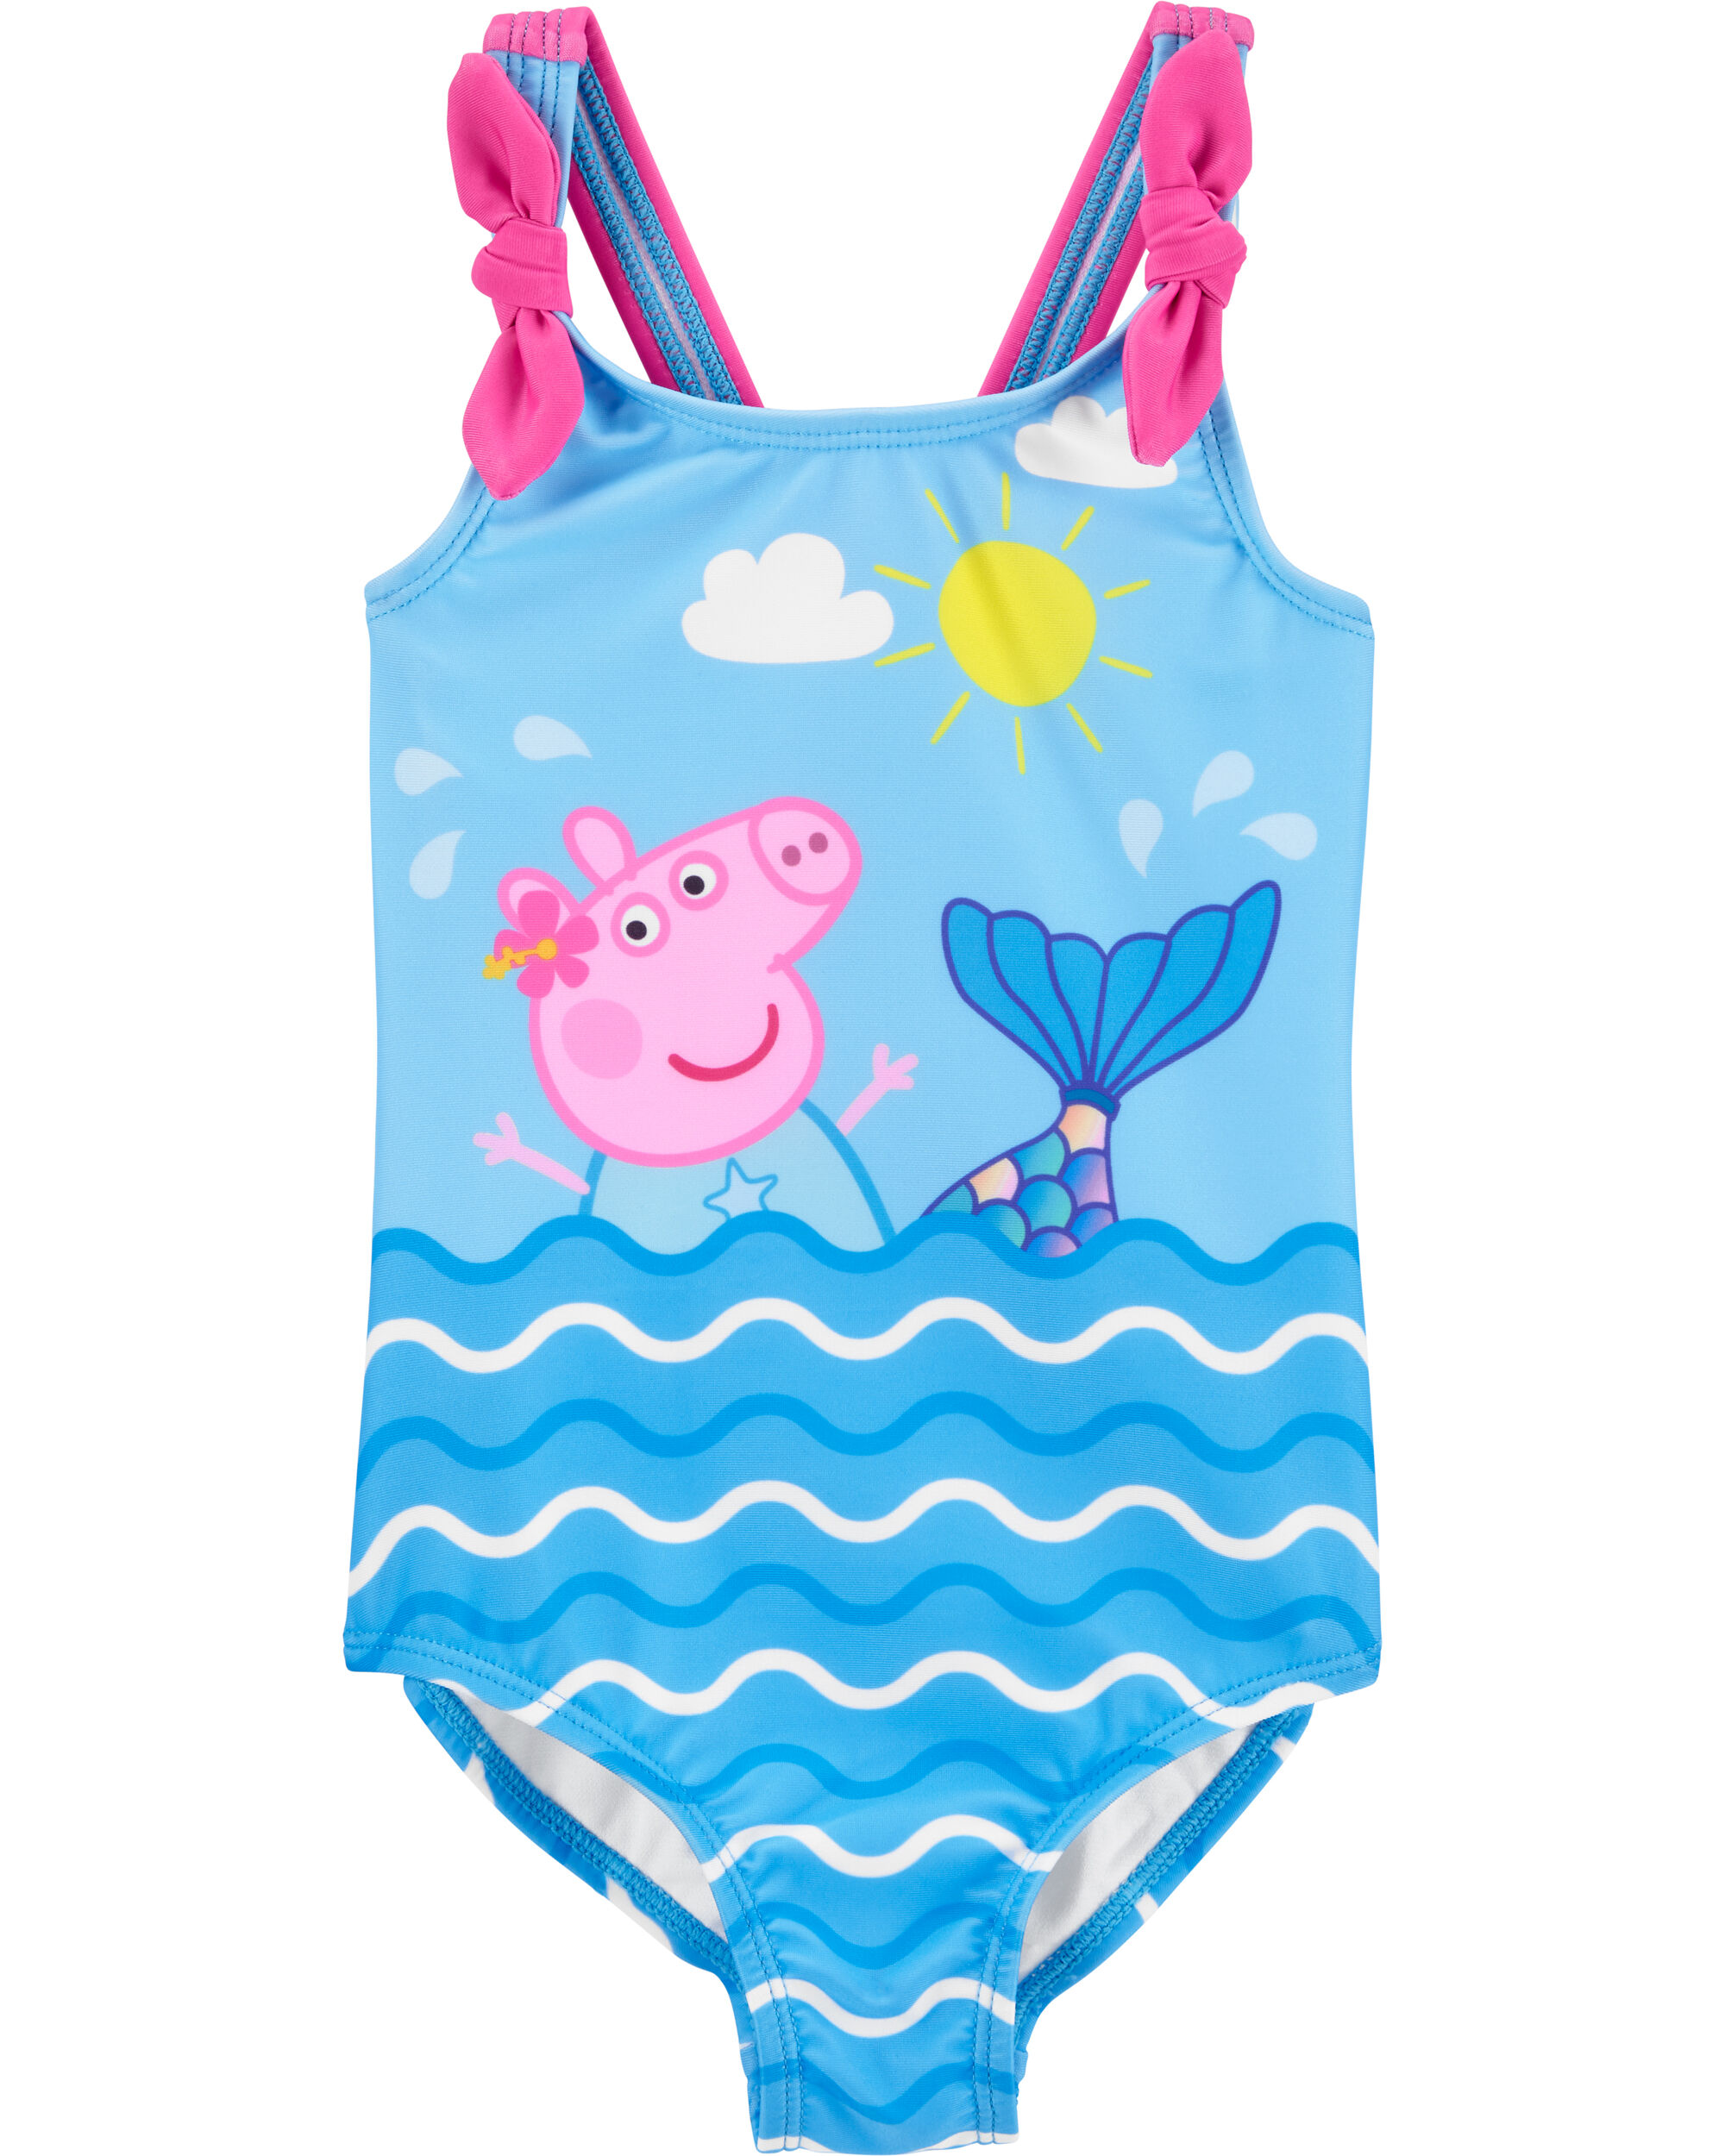 Toddler Girls Peppa Pig 2 Piece Tankini Swimsuit Blue